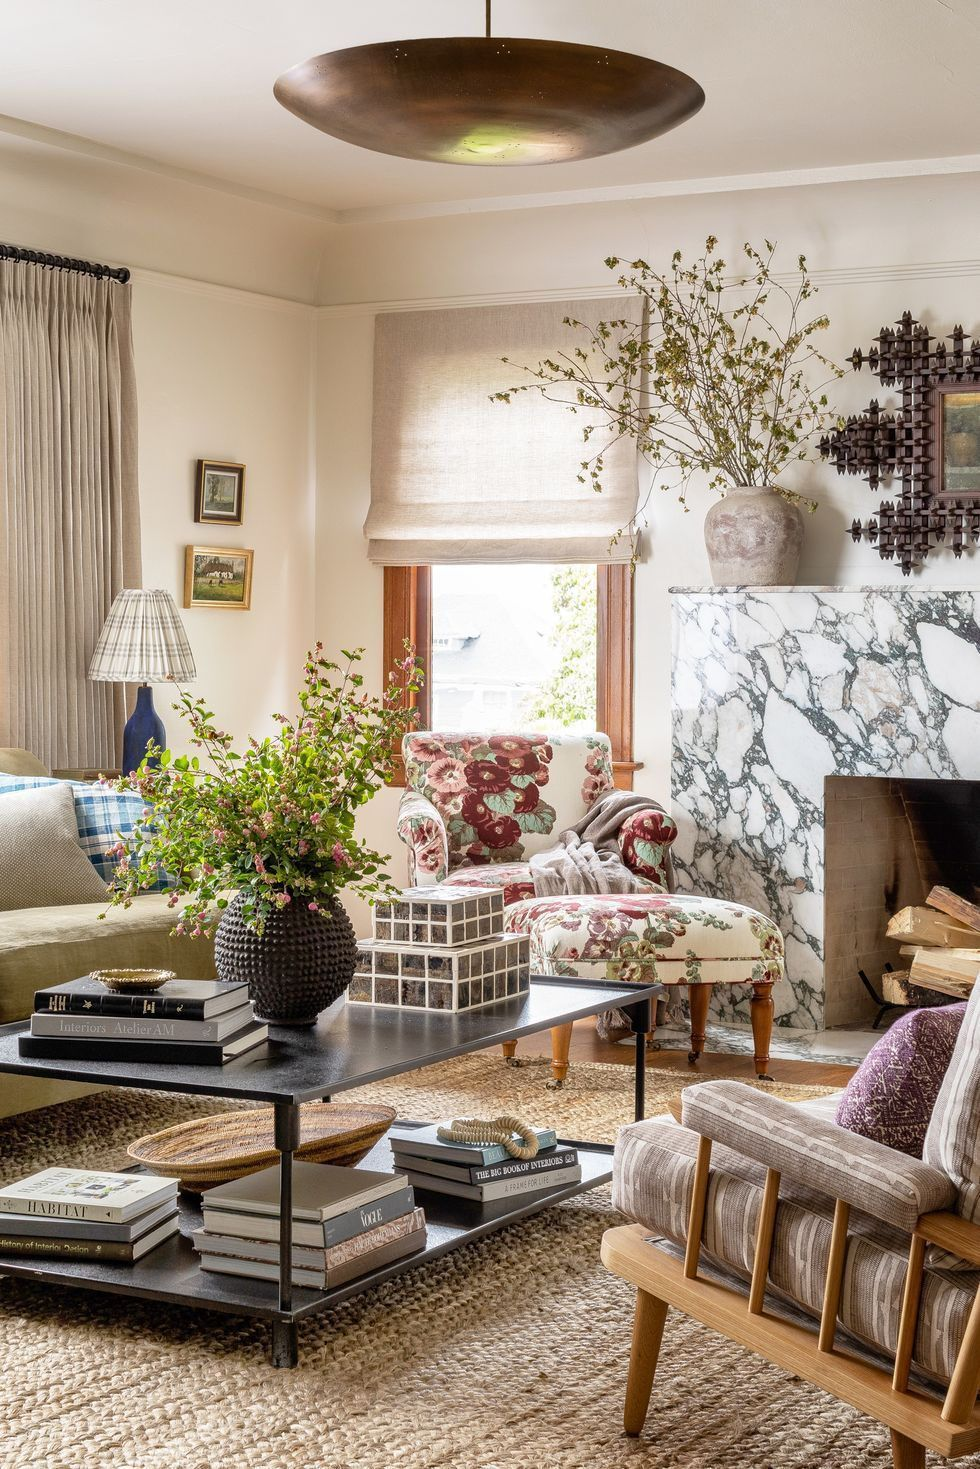 15 Living Room Lighting Ideas That Instantly Brighten Things U